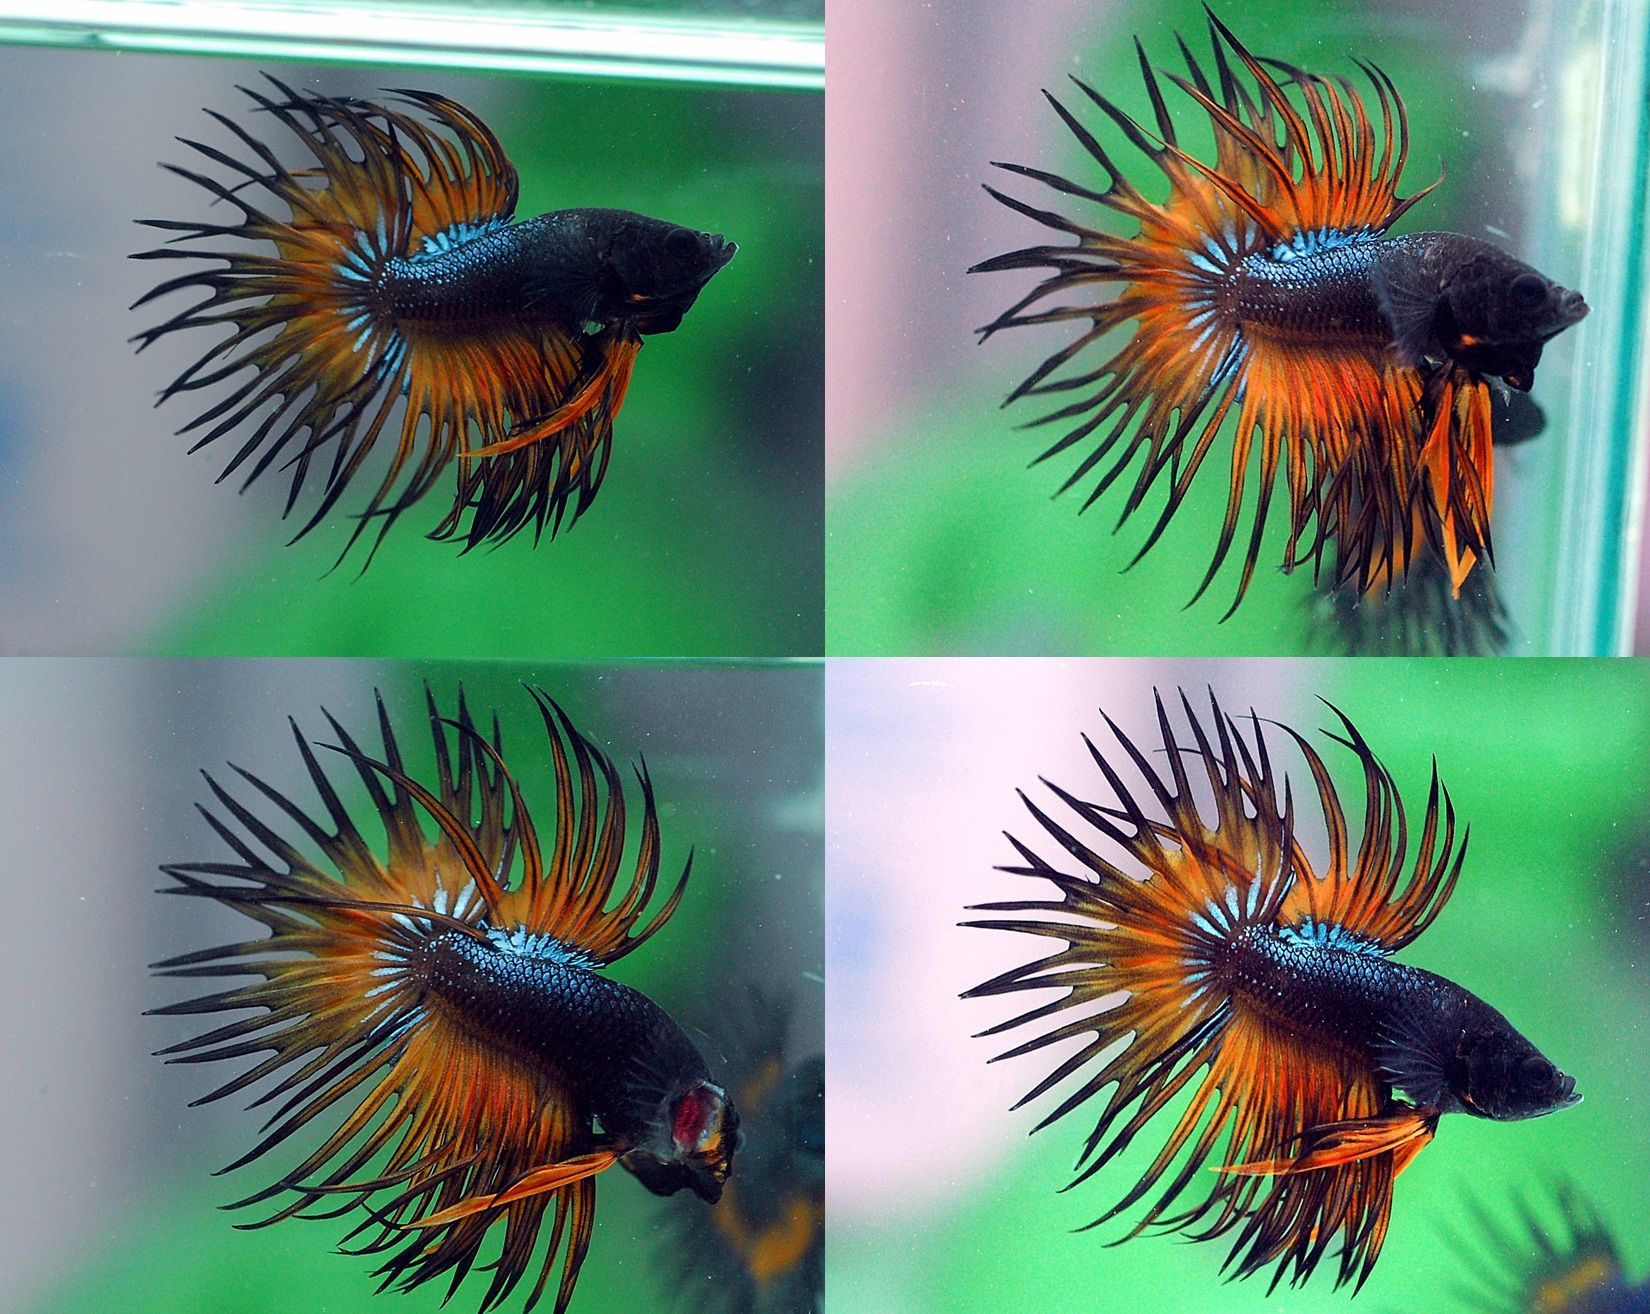 fwbettasct1476005208 - CT MUSTAD 002(MALE)++Home fish betta thailand ...